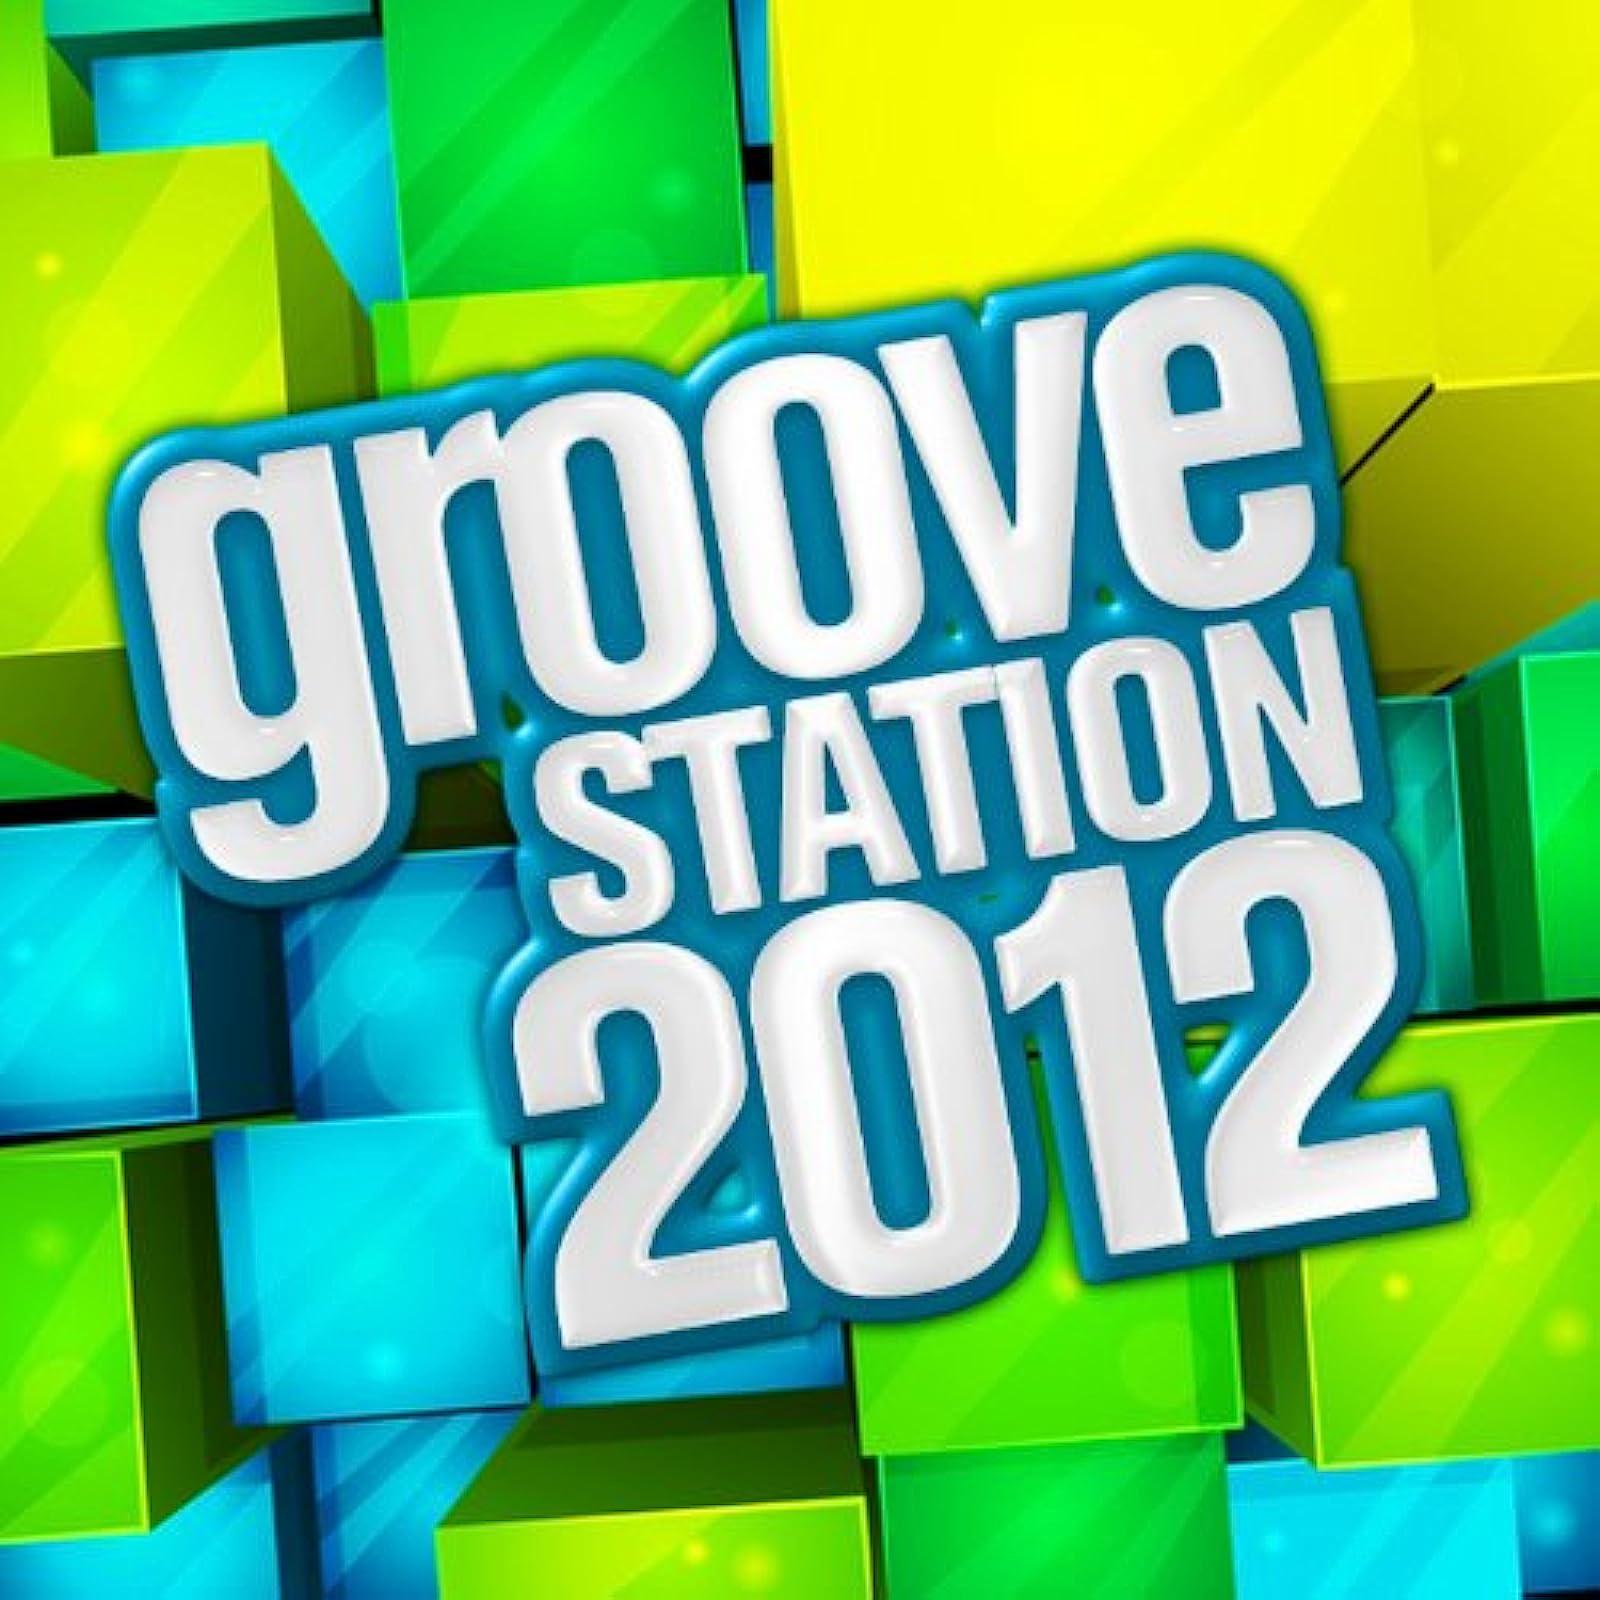 2012 Groove Station On Audio CD Album